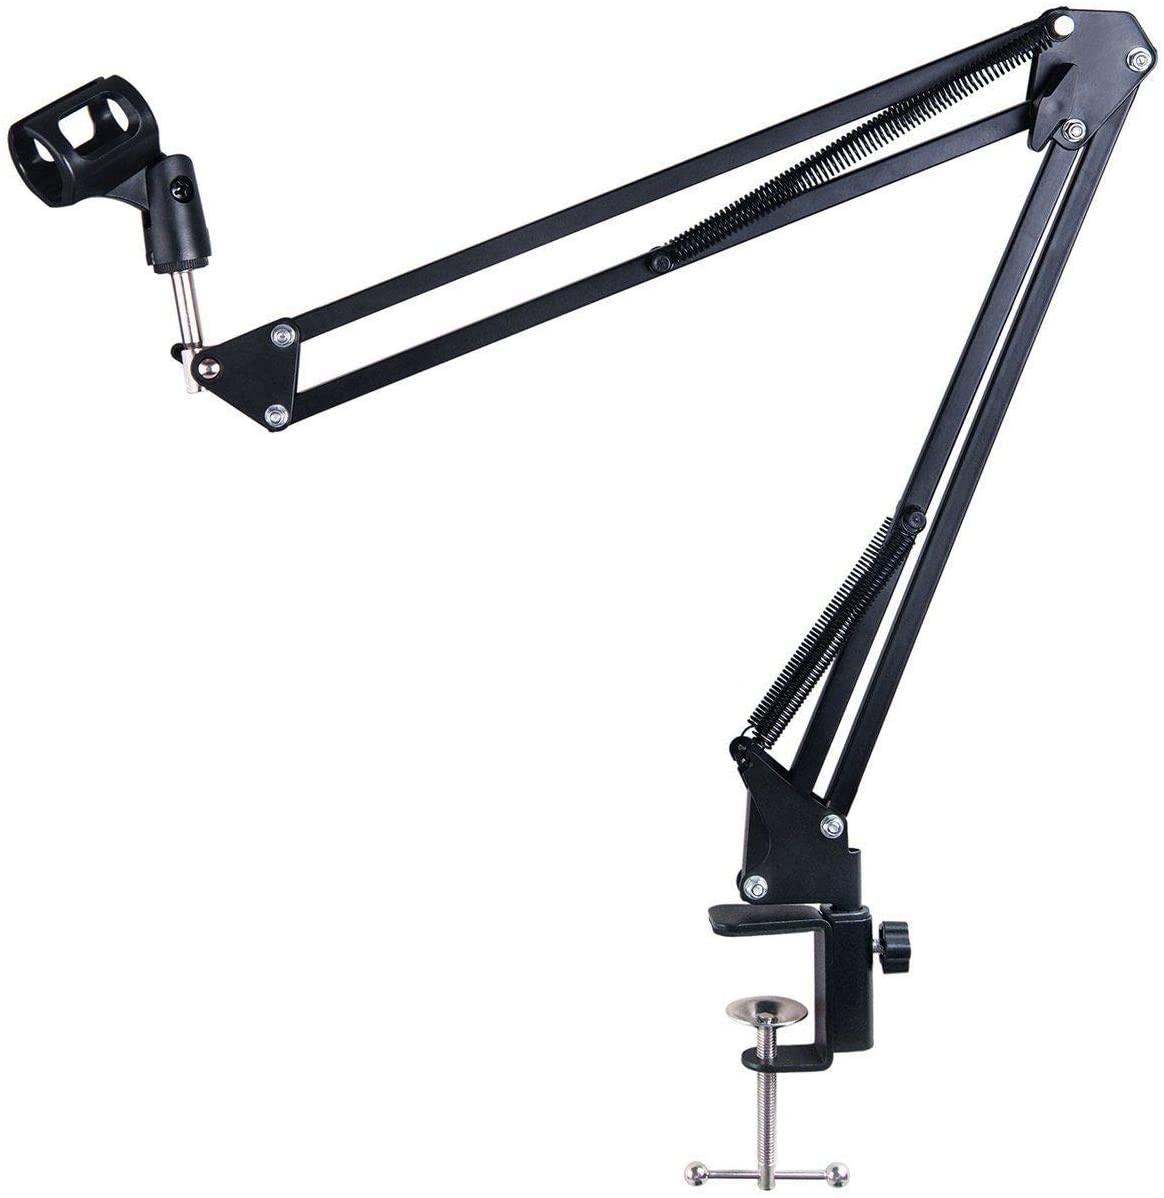 Studio Microphone Stand, Suspension Boom Scissor Arm Stand, Desktop Mic Holder for Broadcasting, Stage, TV Station